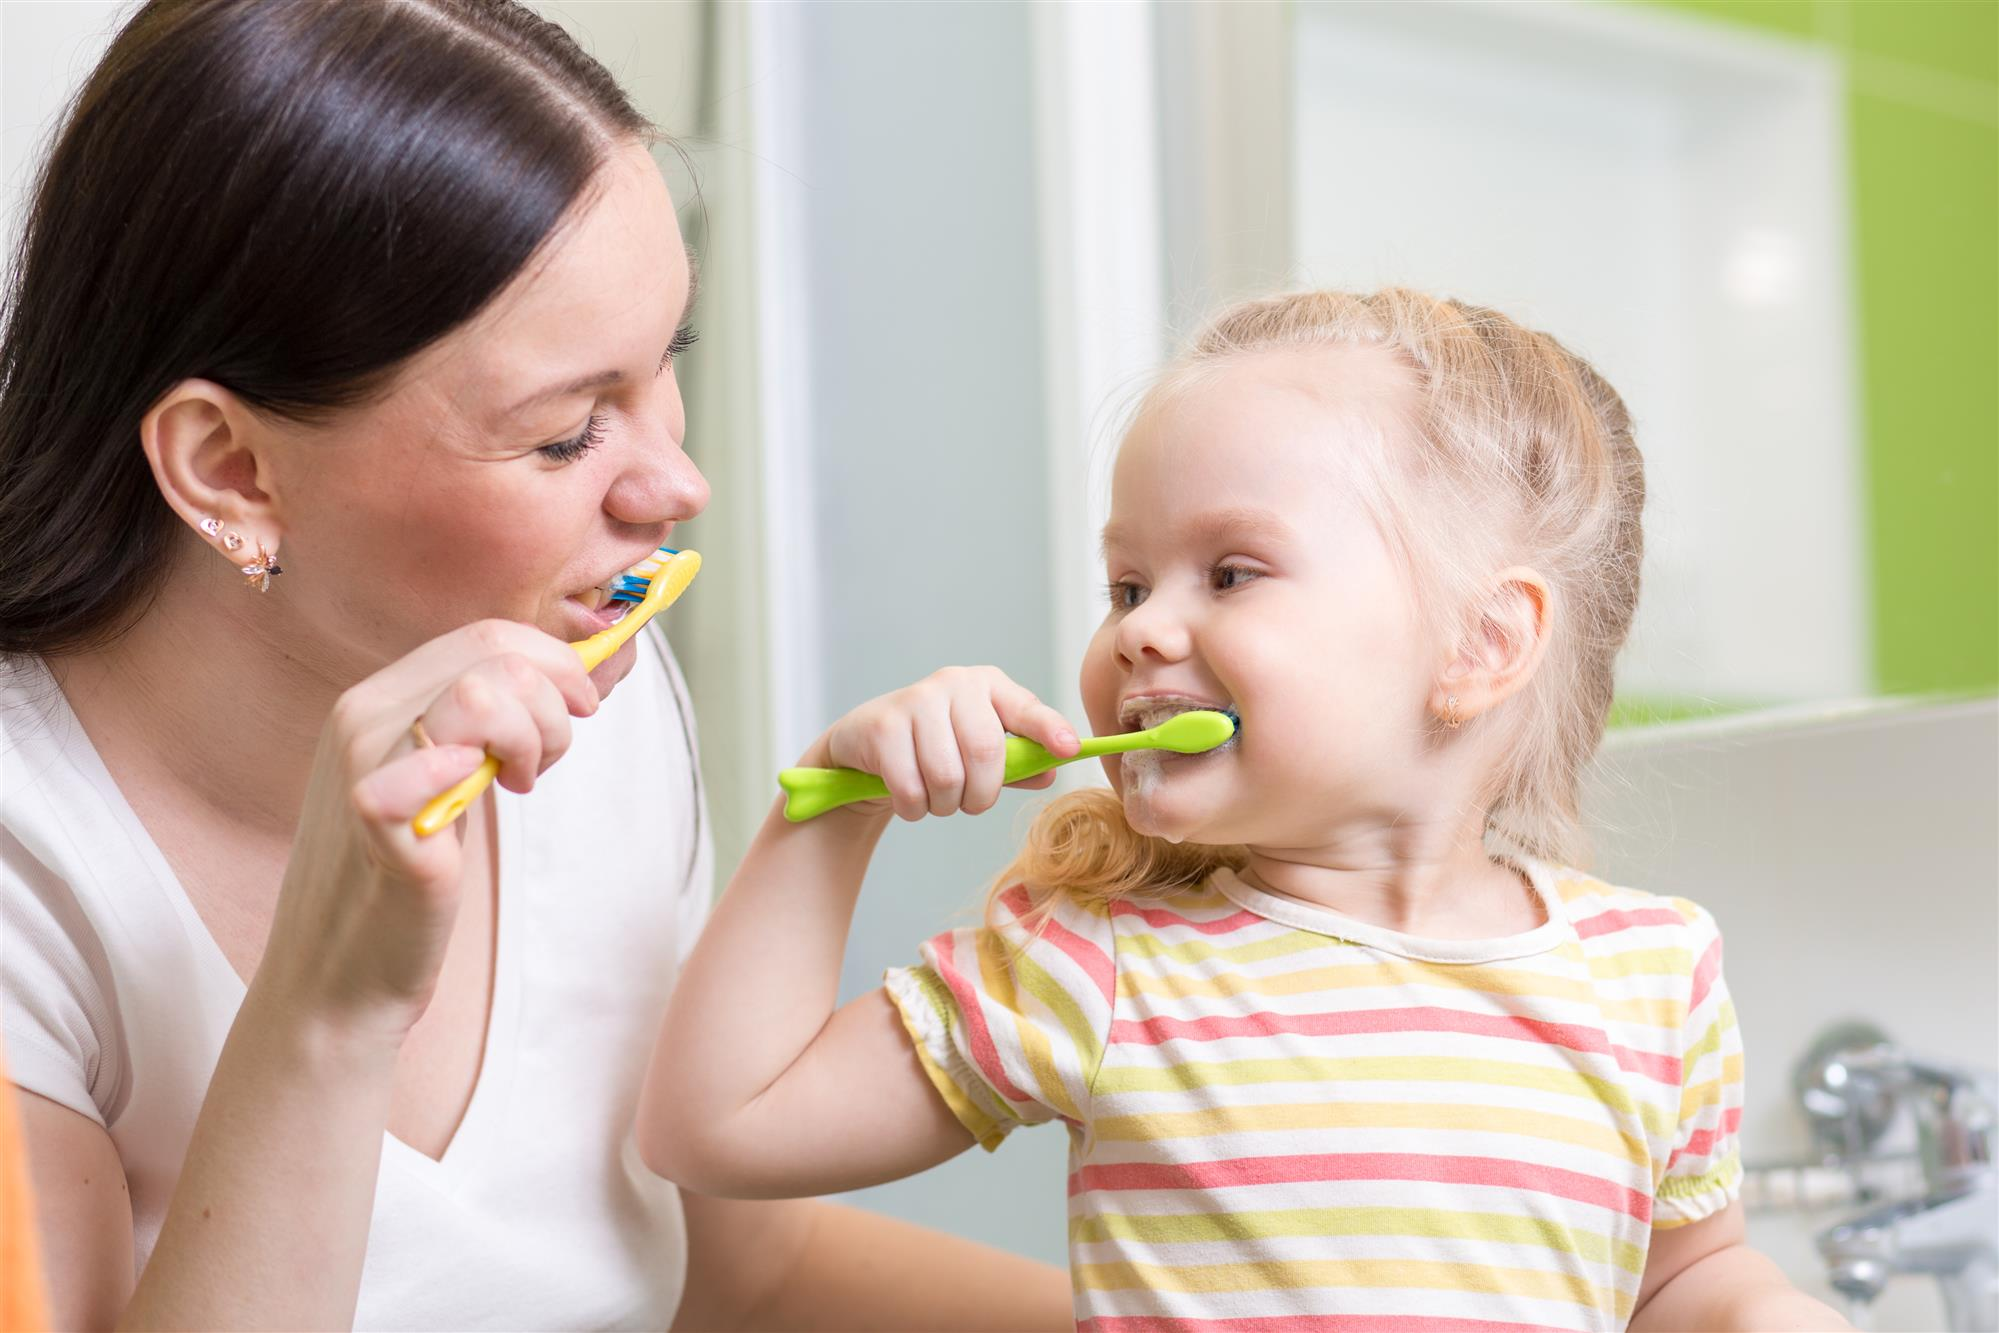 Mom Brushing Teeth with Girl